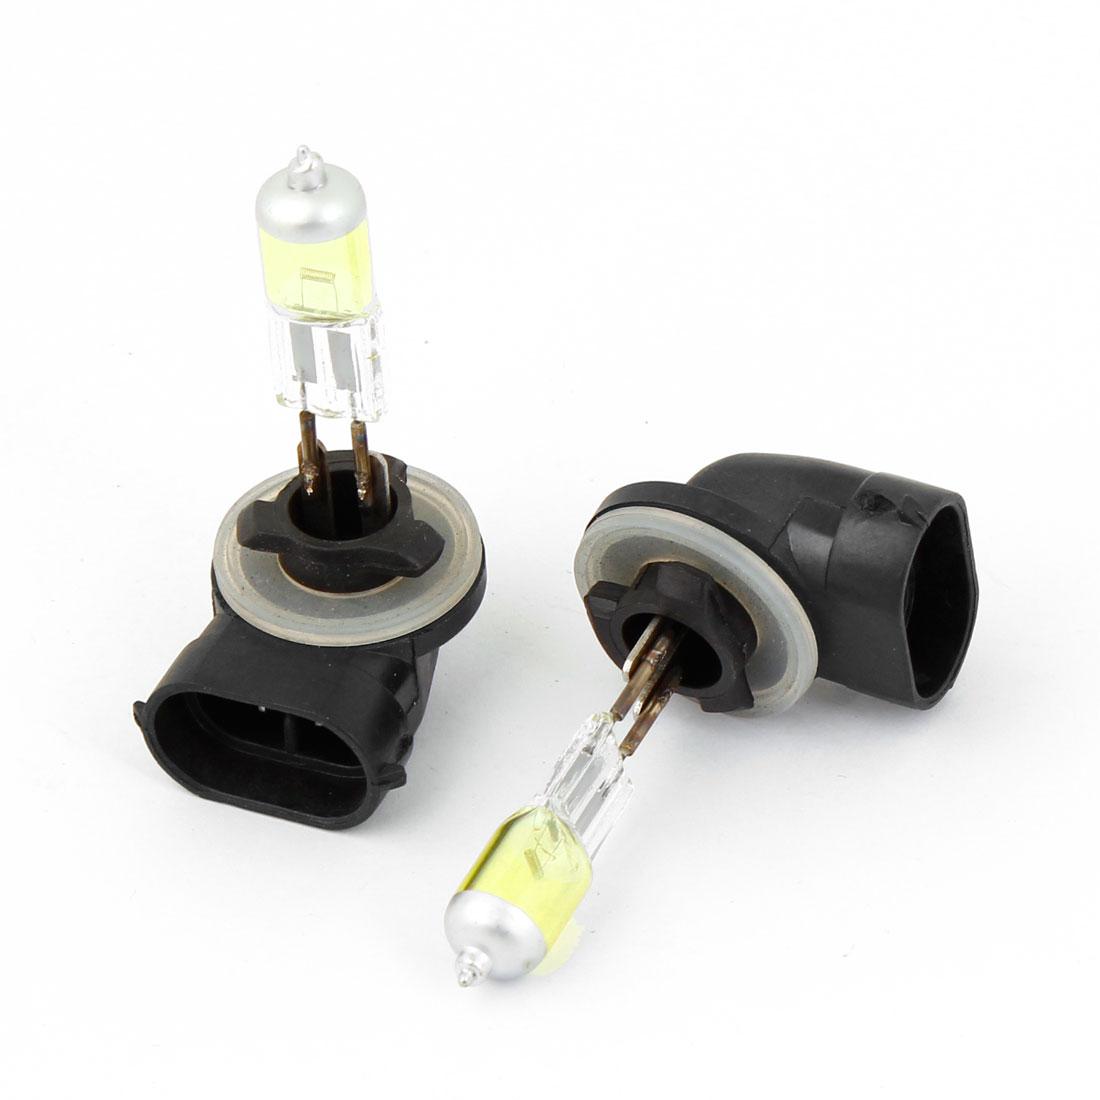 2pcs DC 12V Halogen 881 100W Amber Auto Car Foglight Light